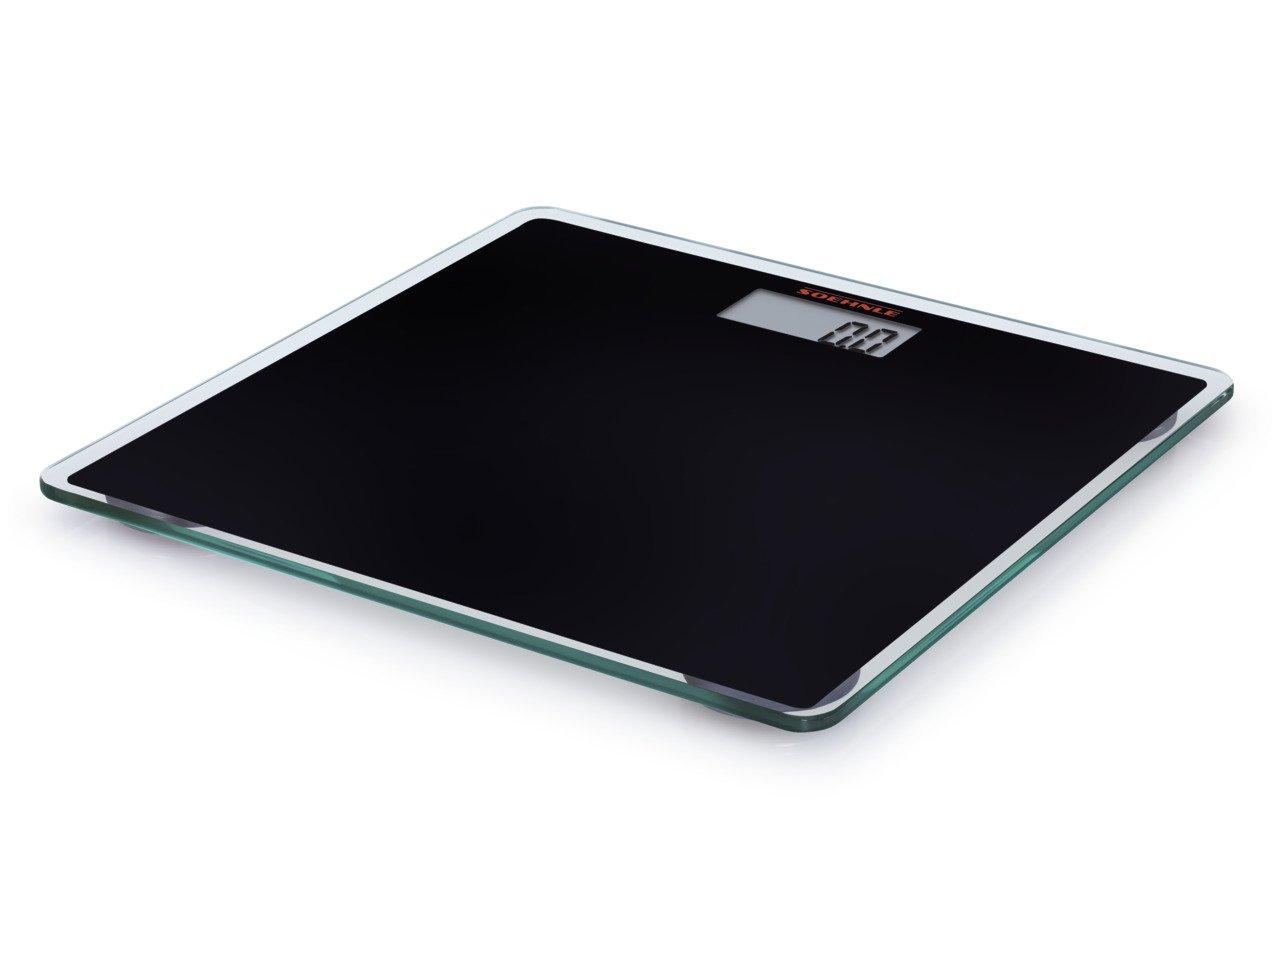 Soehnle Bilancia 63558 SLIM White digitale persone pesa